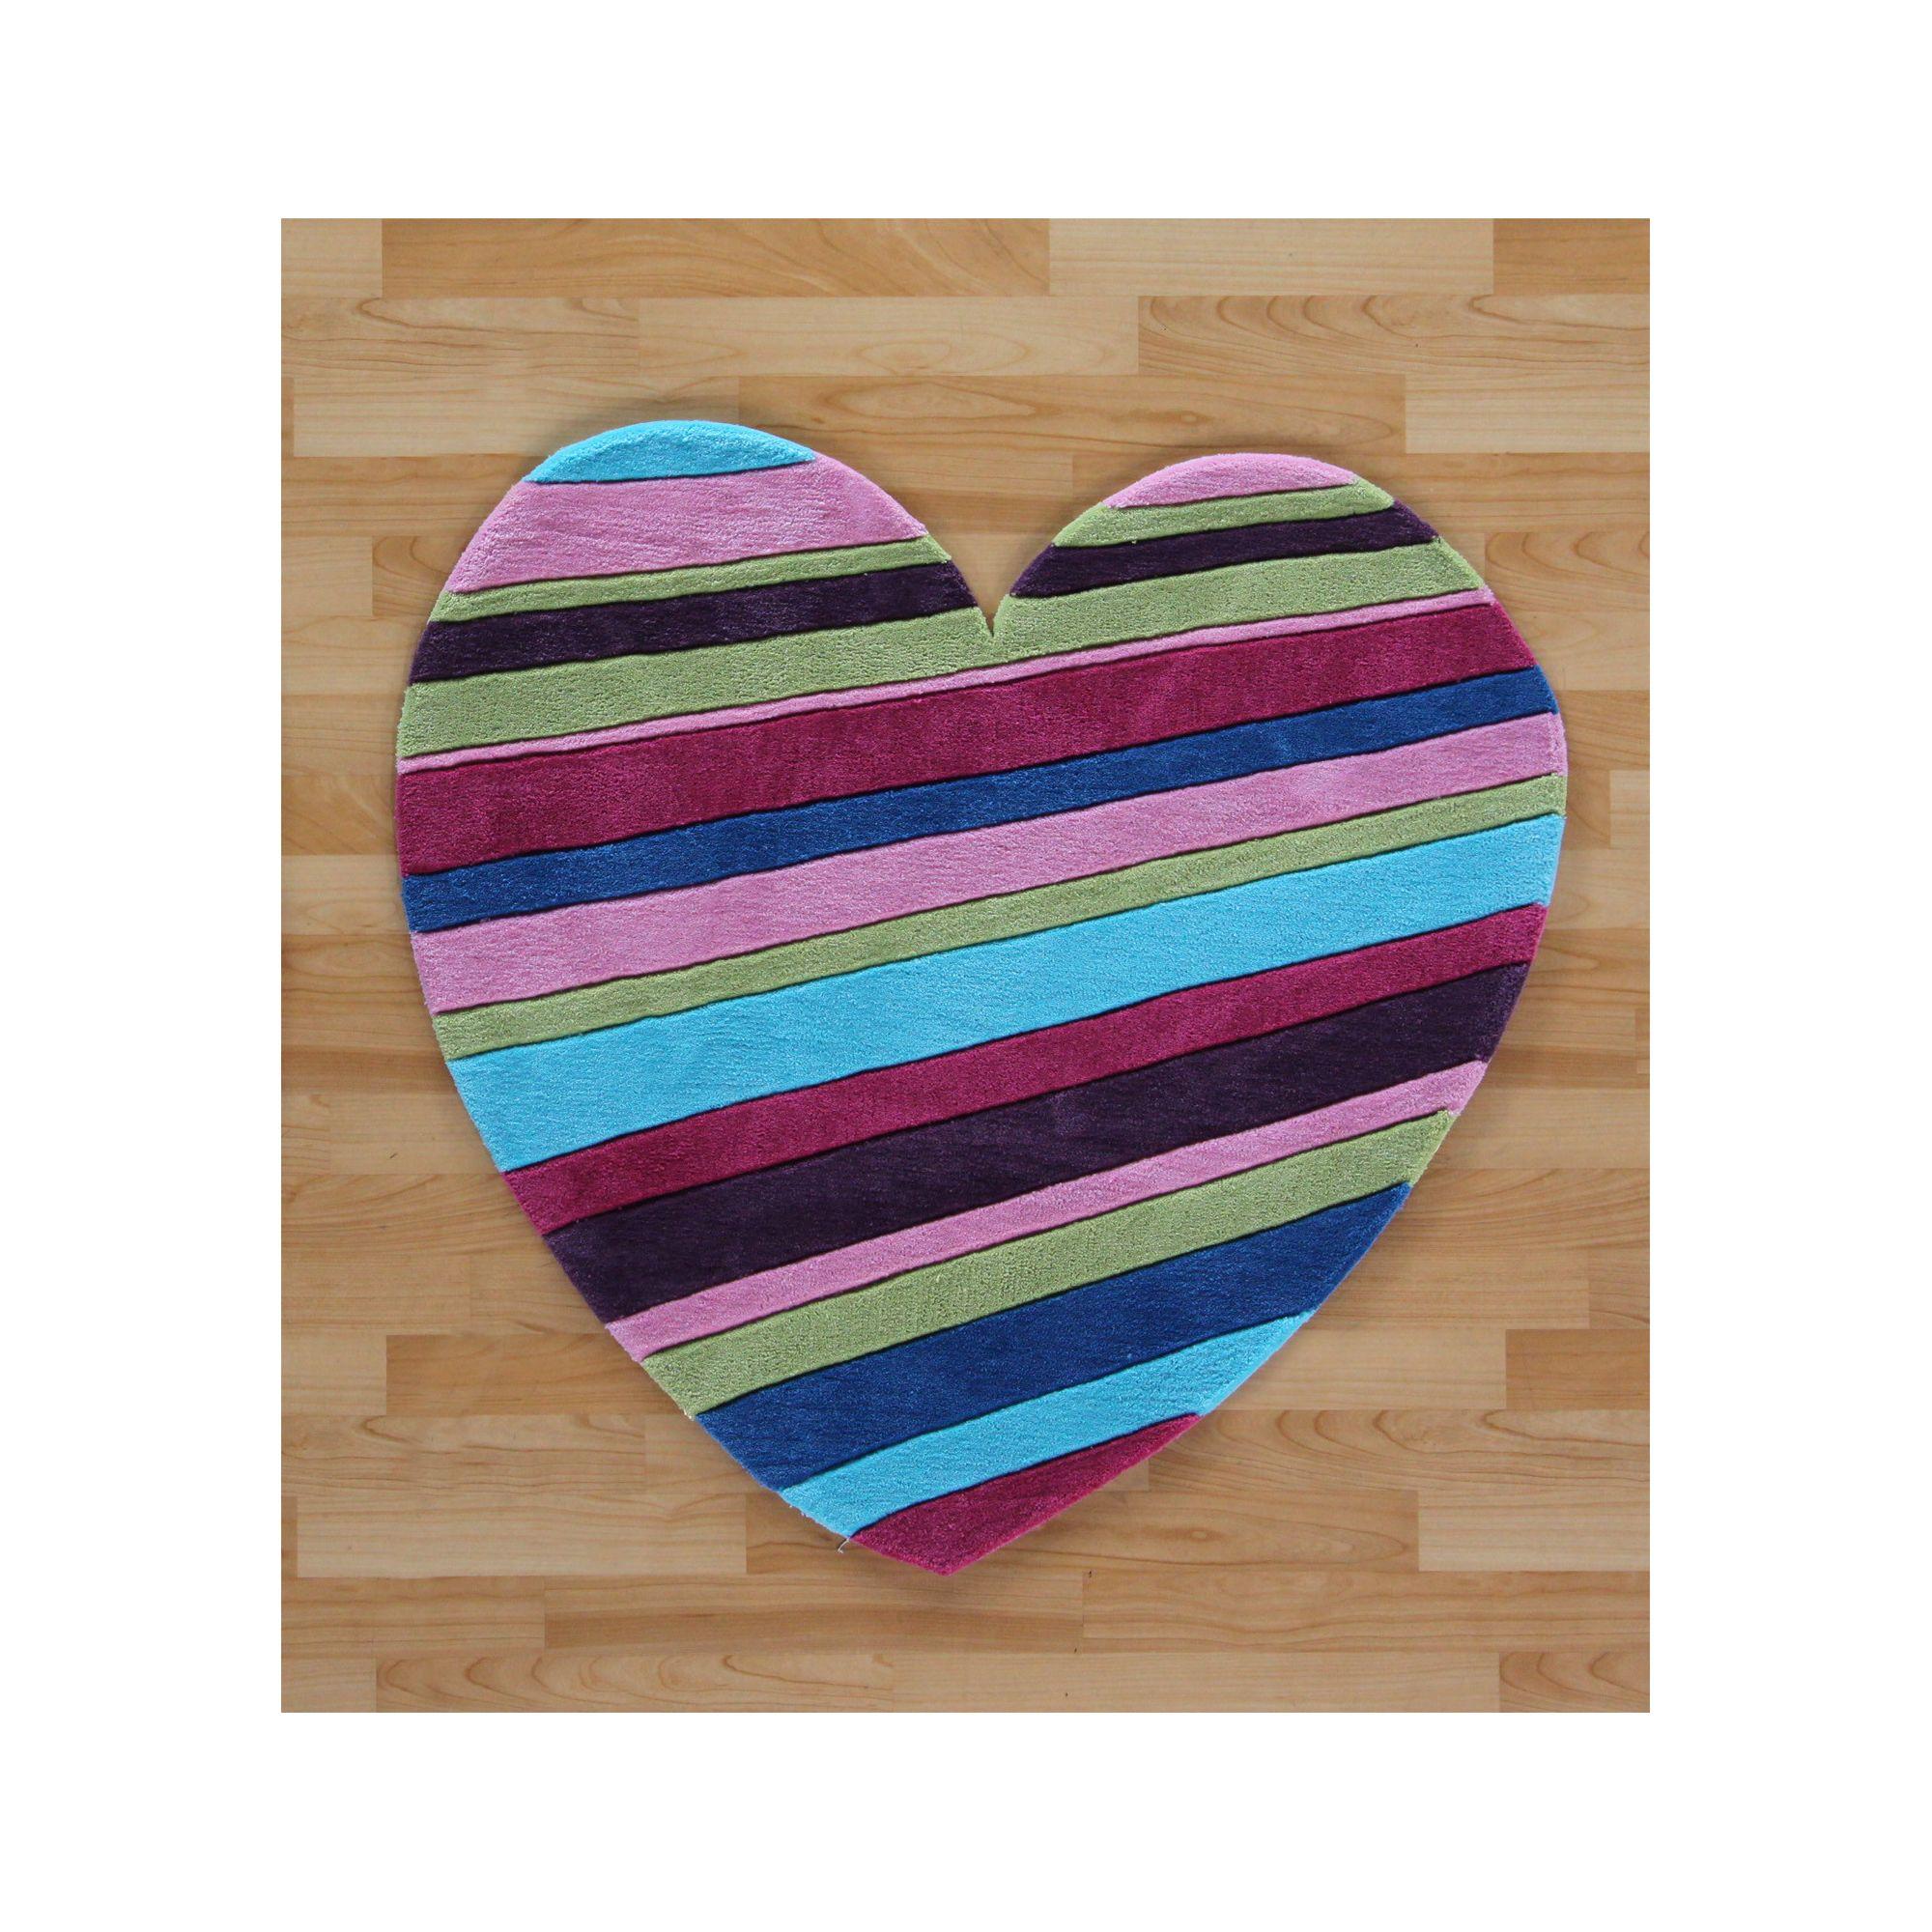 Oriental Carpets & Rugs Hong Kong Kids Striped Heart Tufted Kids Rug - 90cm L x 90cm W